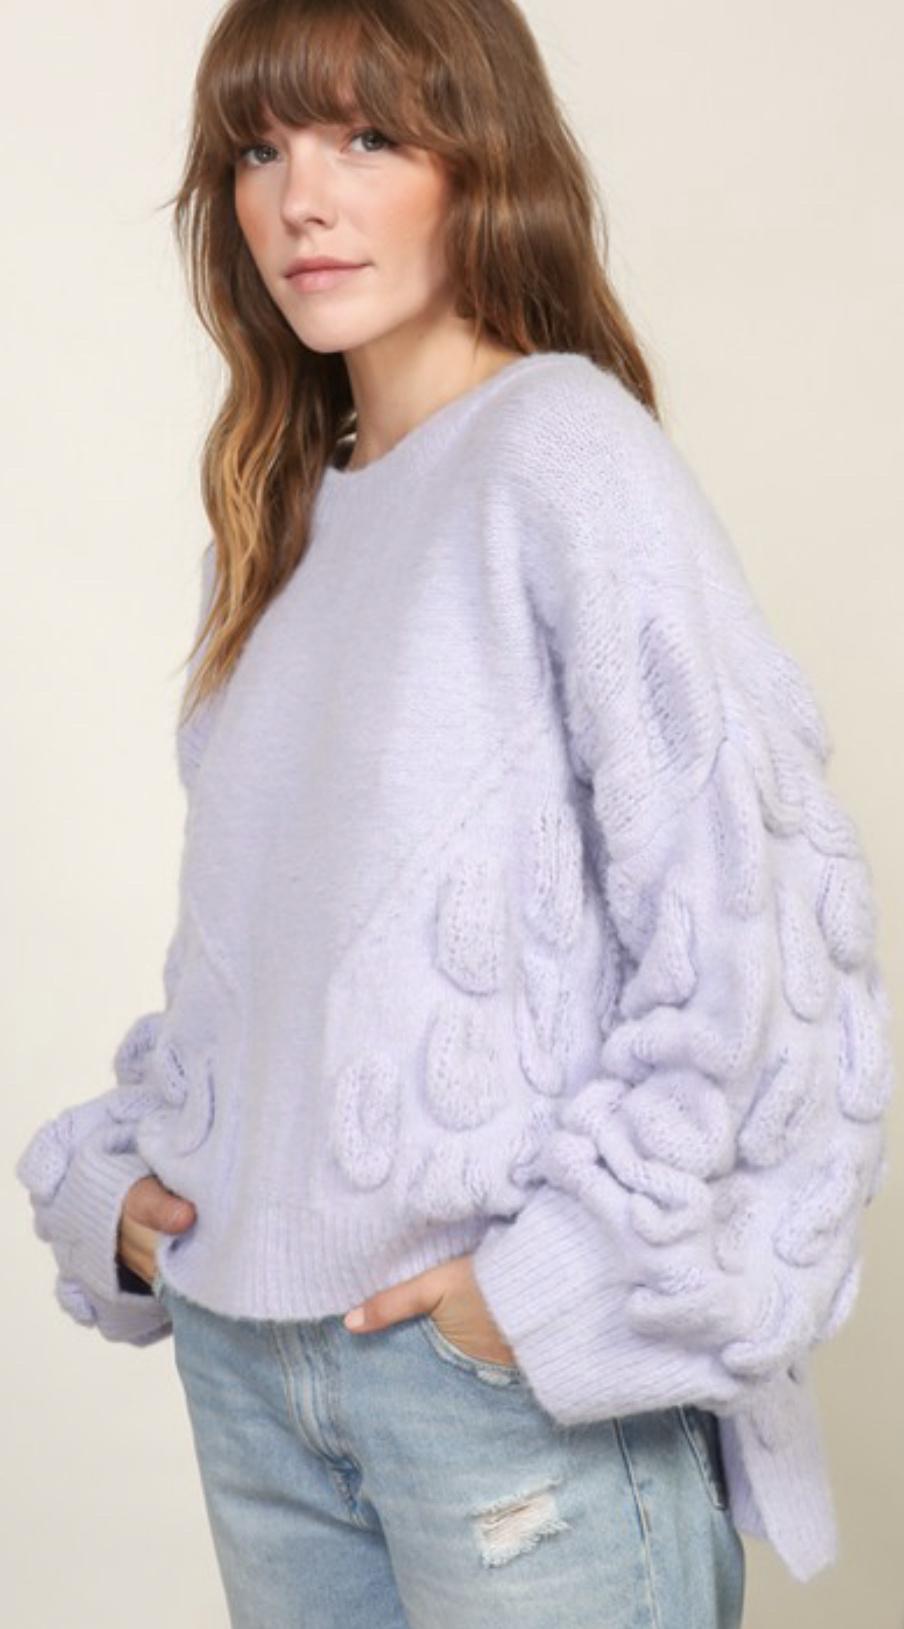 Lumiere Natalie Spring Knit